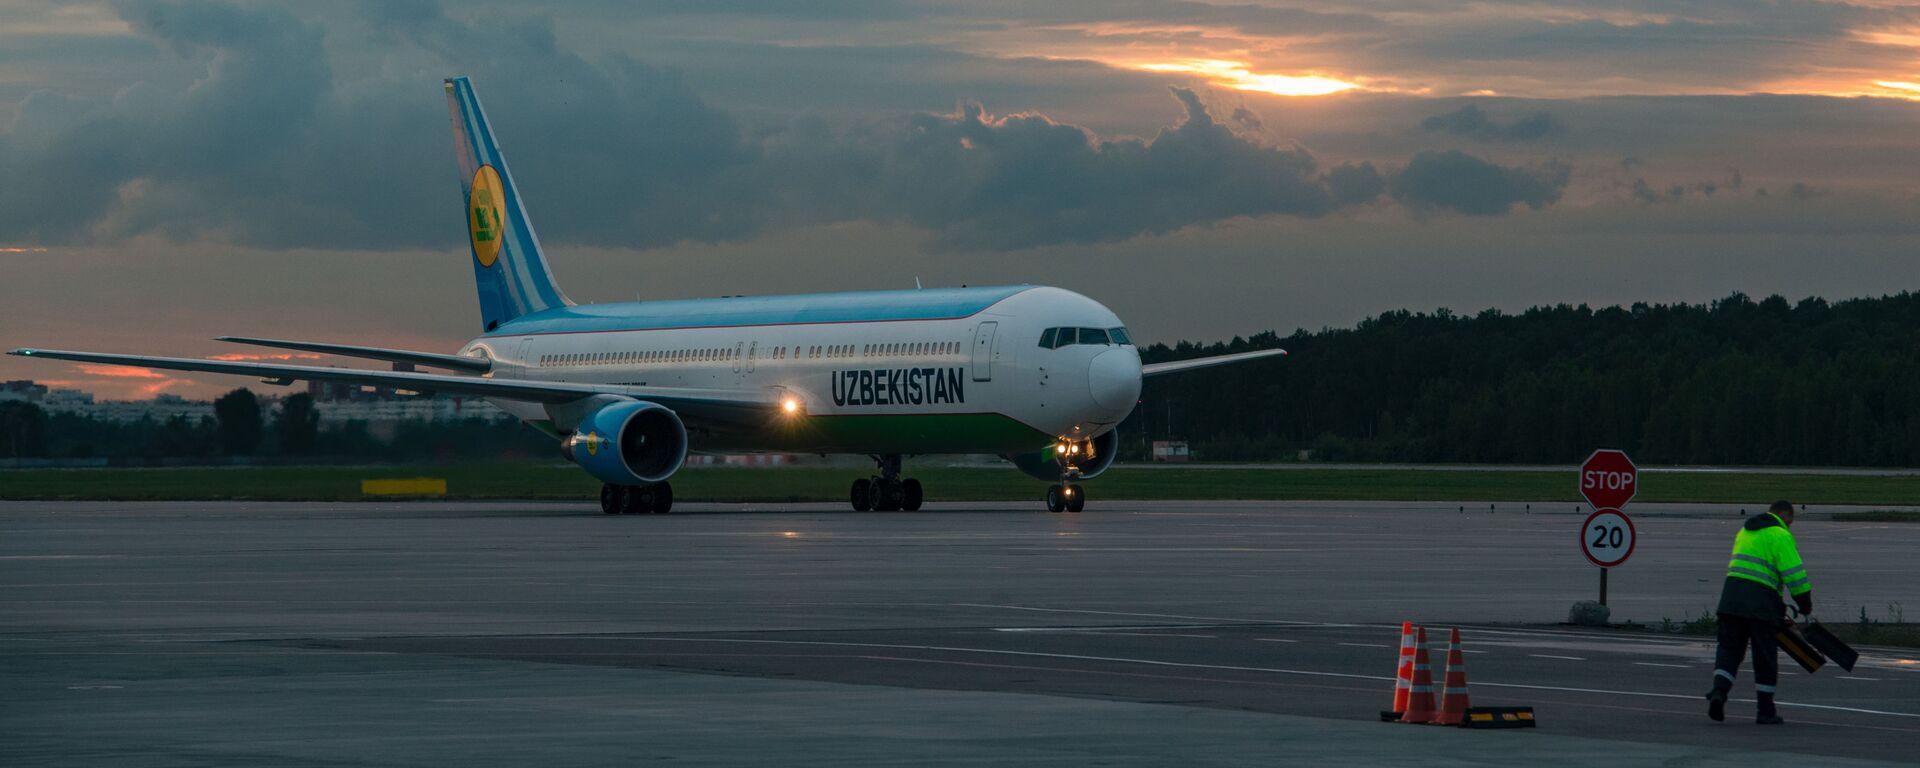 Самолет Airbus A320 компании Uzbekistan Airways - Sputnik Узбекистан, 1920, 10.04.2021